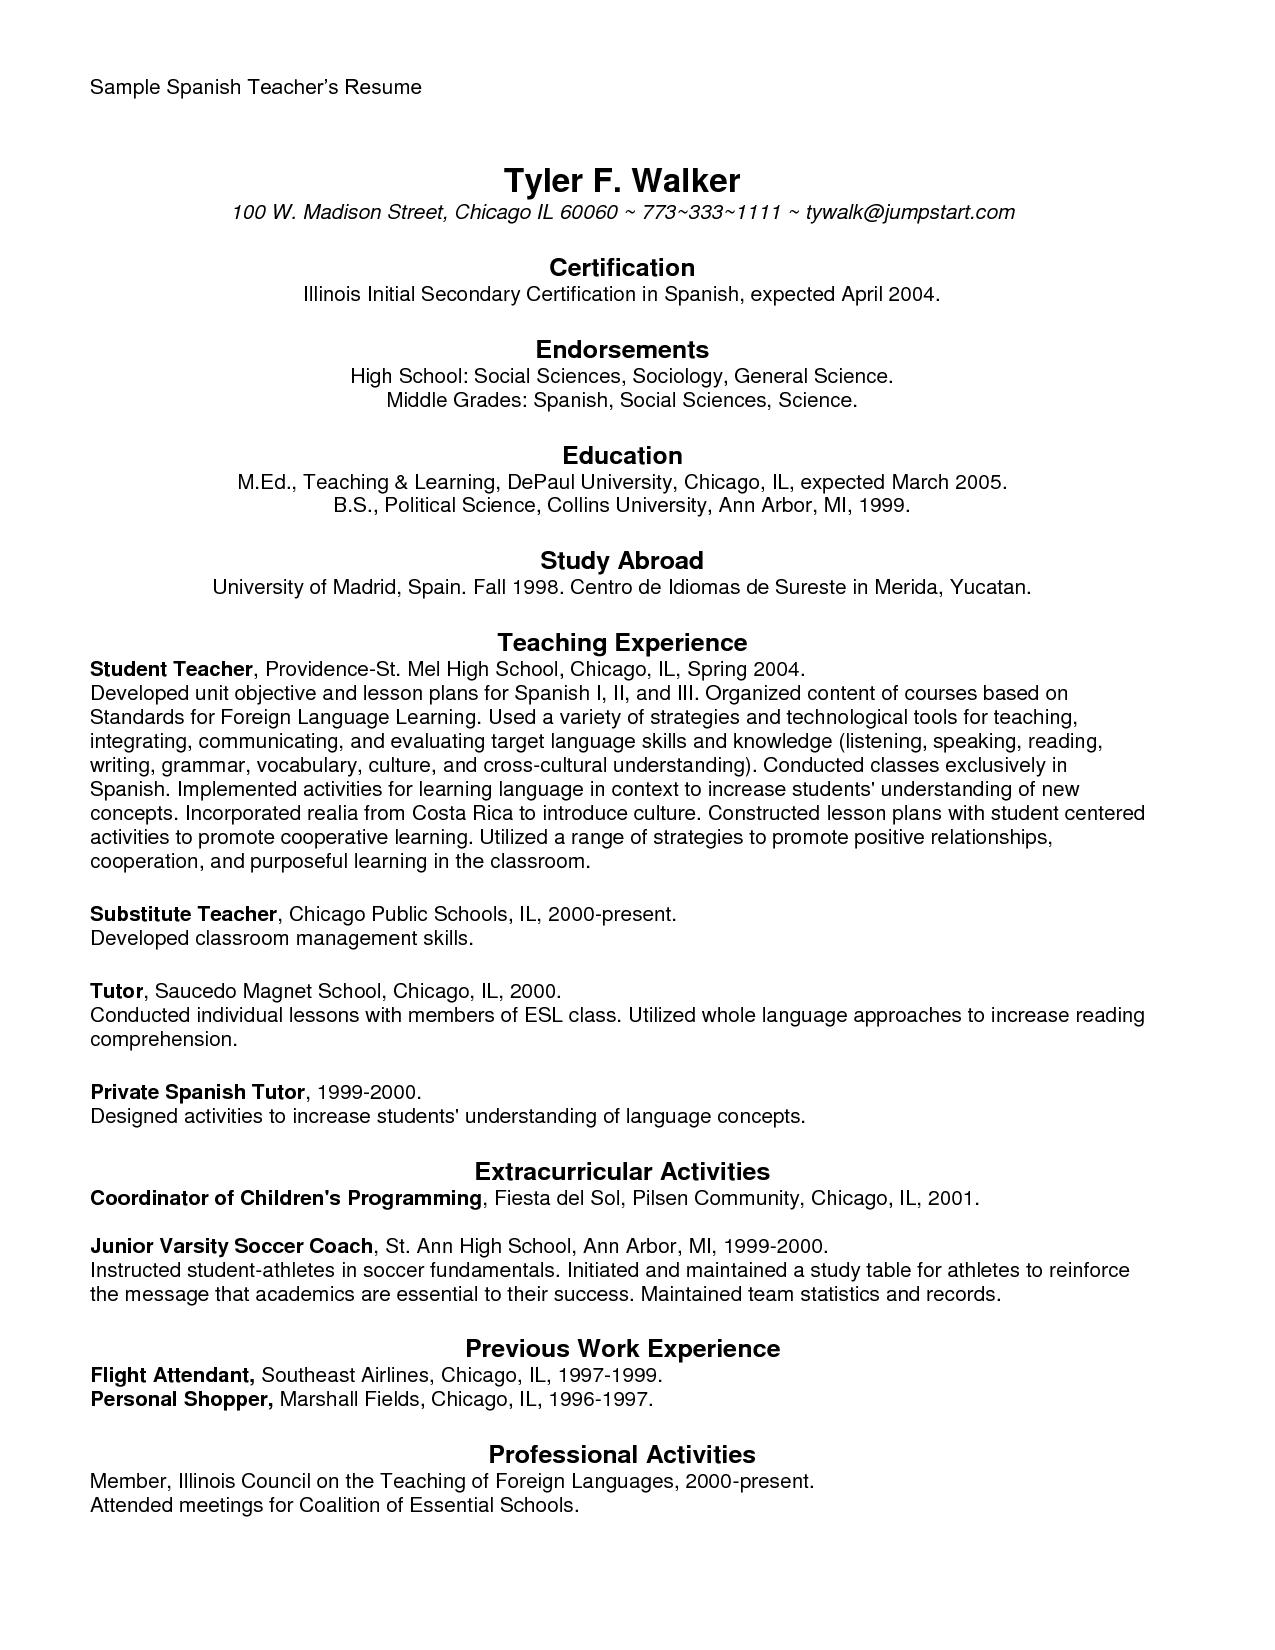 Resume Templates In Spanish Resumetemplates Teacherresume Teacher Resume Teacher Resume Template Resume Examples